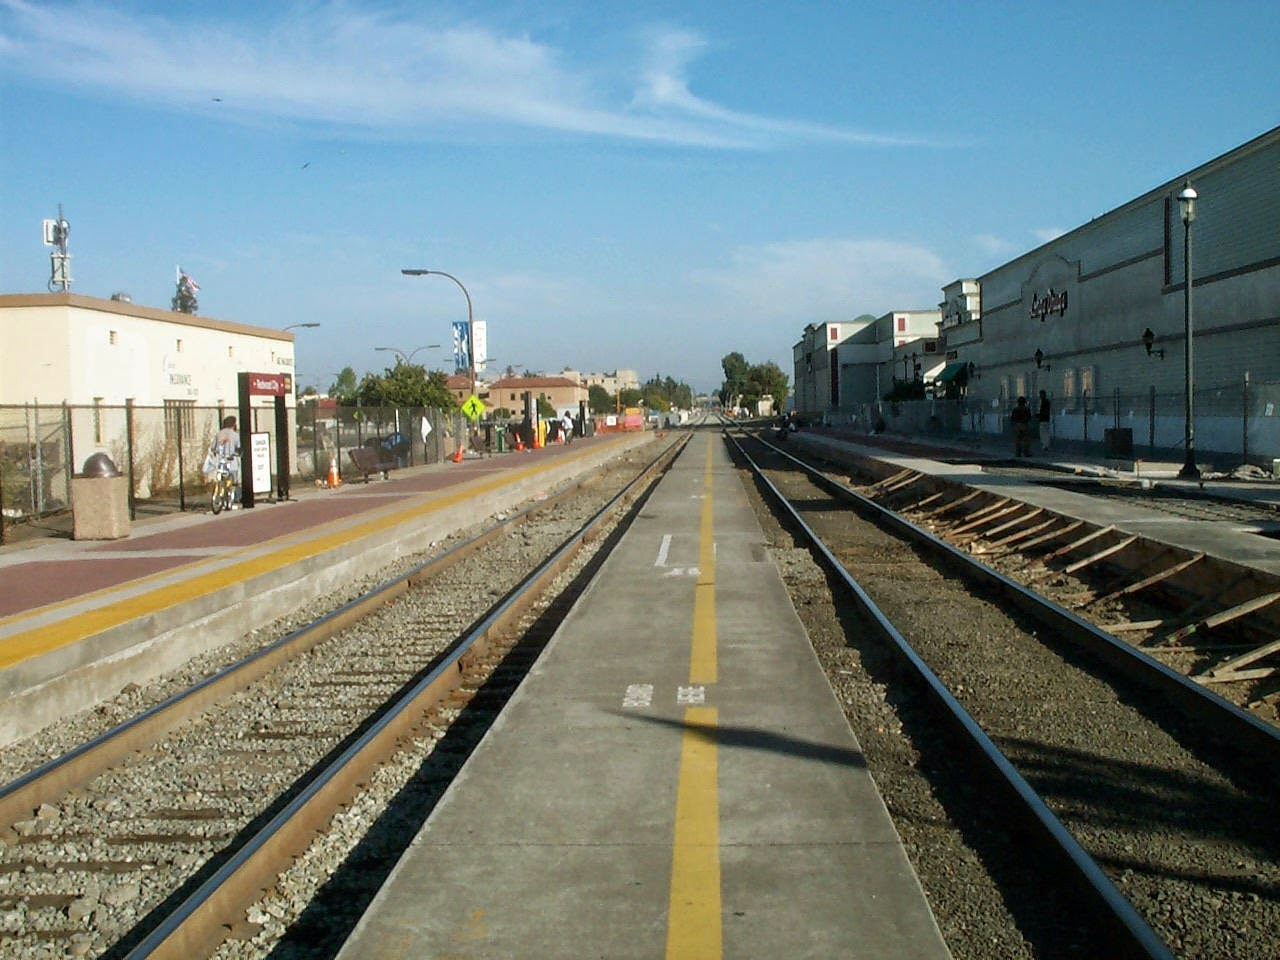 Caltrain HSR Compatibility Blog: The Great Platform